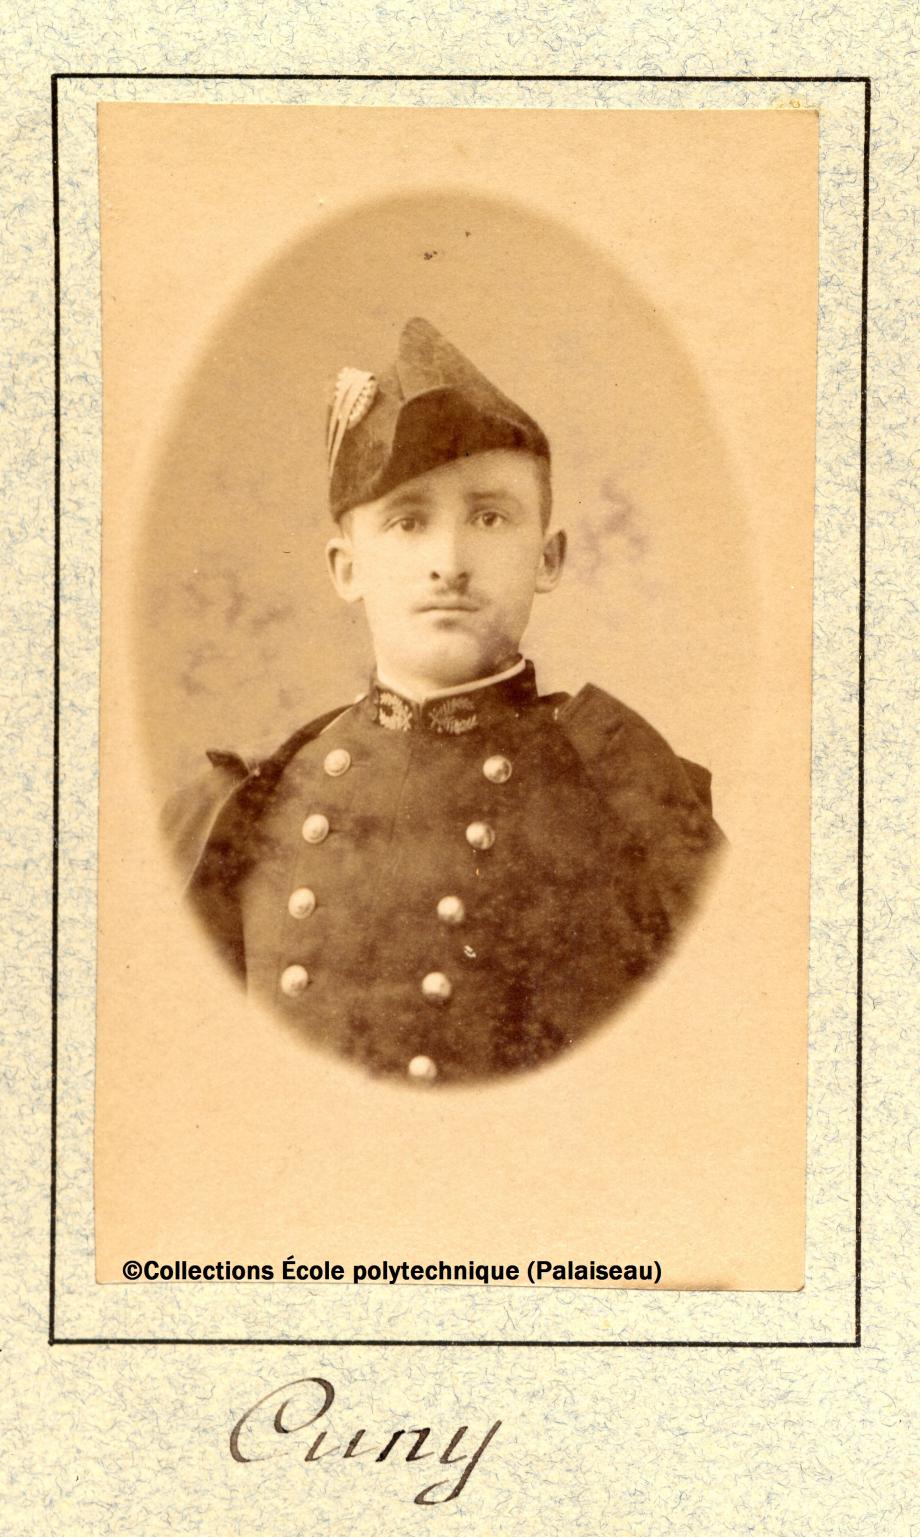 1892 Georges CUNY X1892 scan Olivier Azzola X.jpg